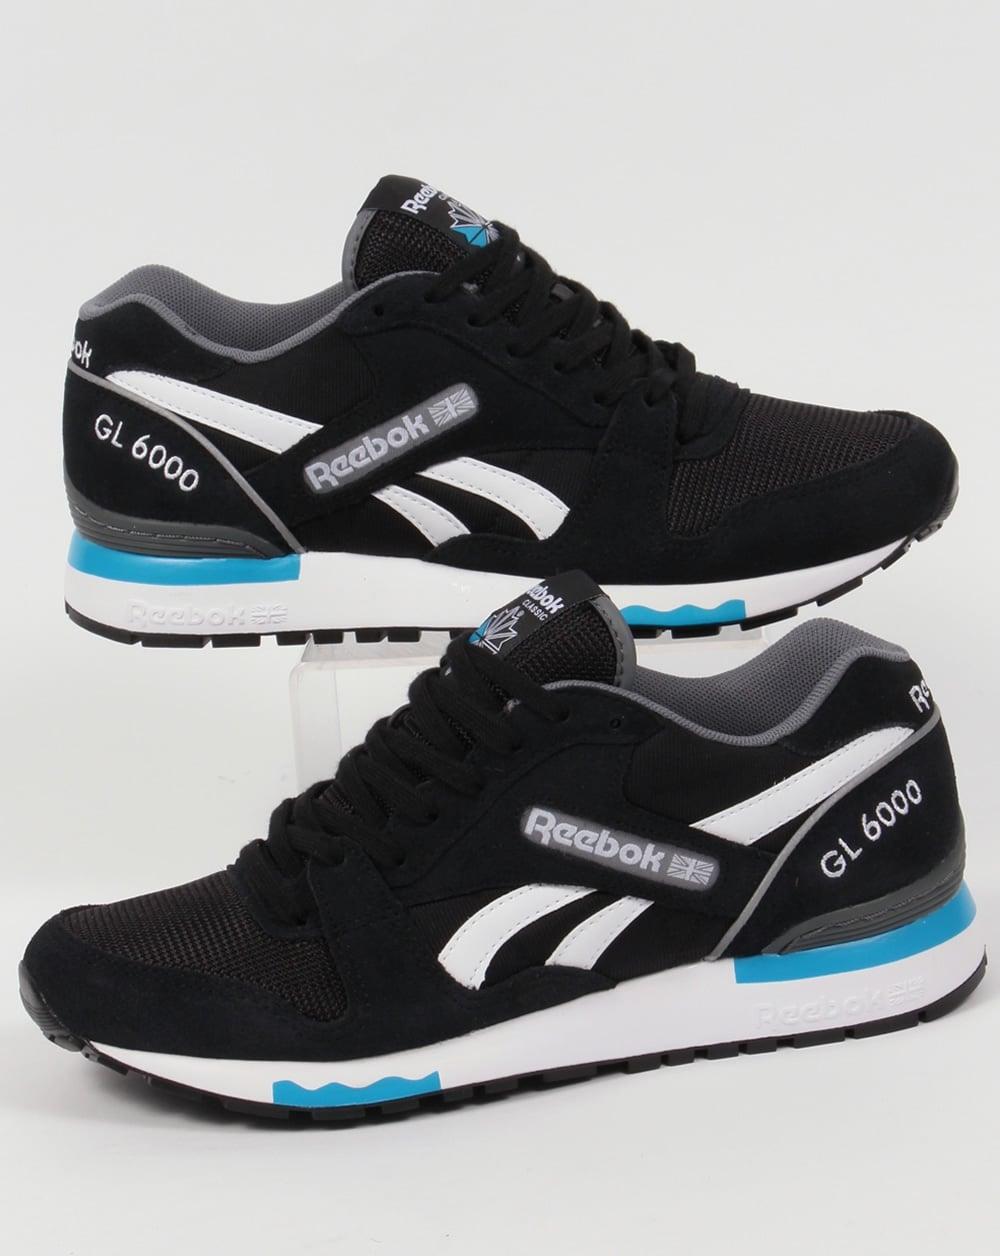 wholesale dealer a1c21 e4c42 Reebok Reebok GL 6000 PP Trainers Black Alloy Blue